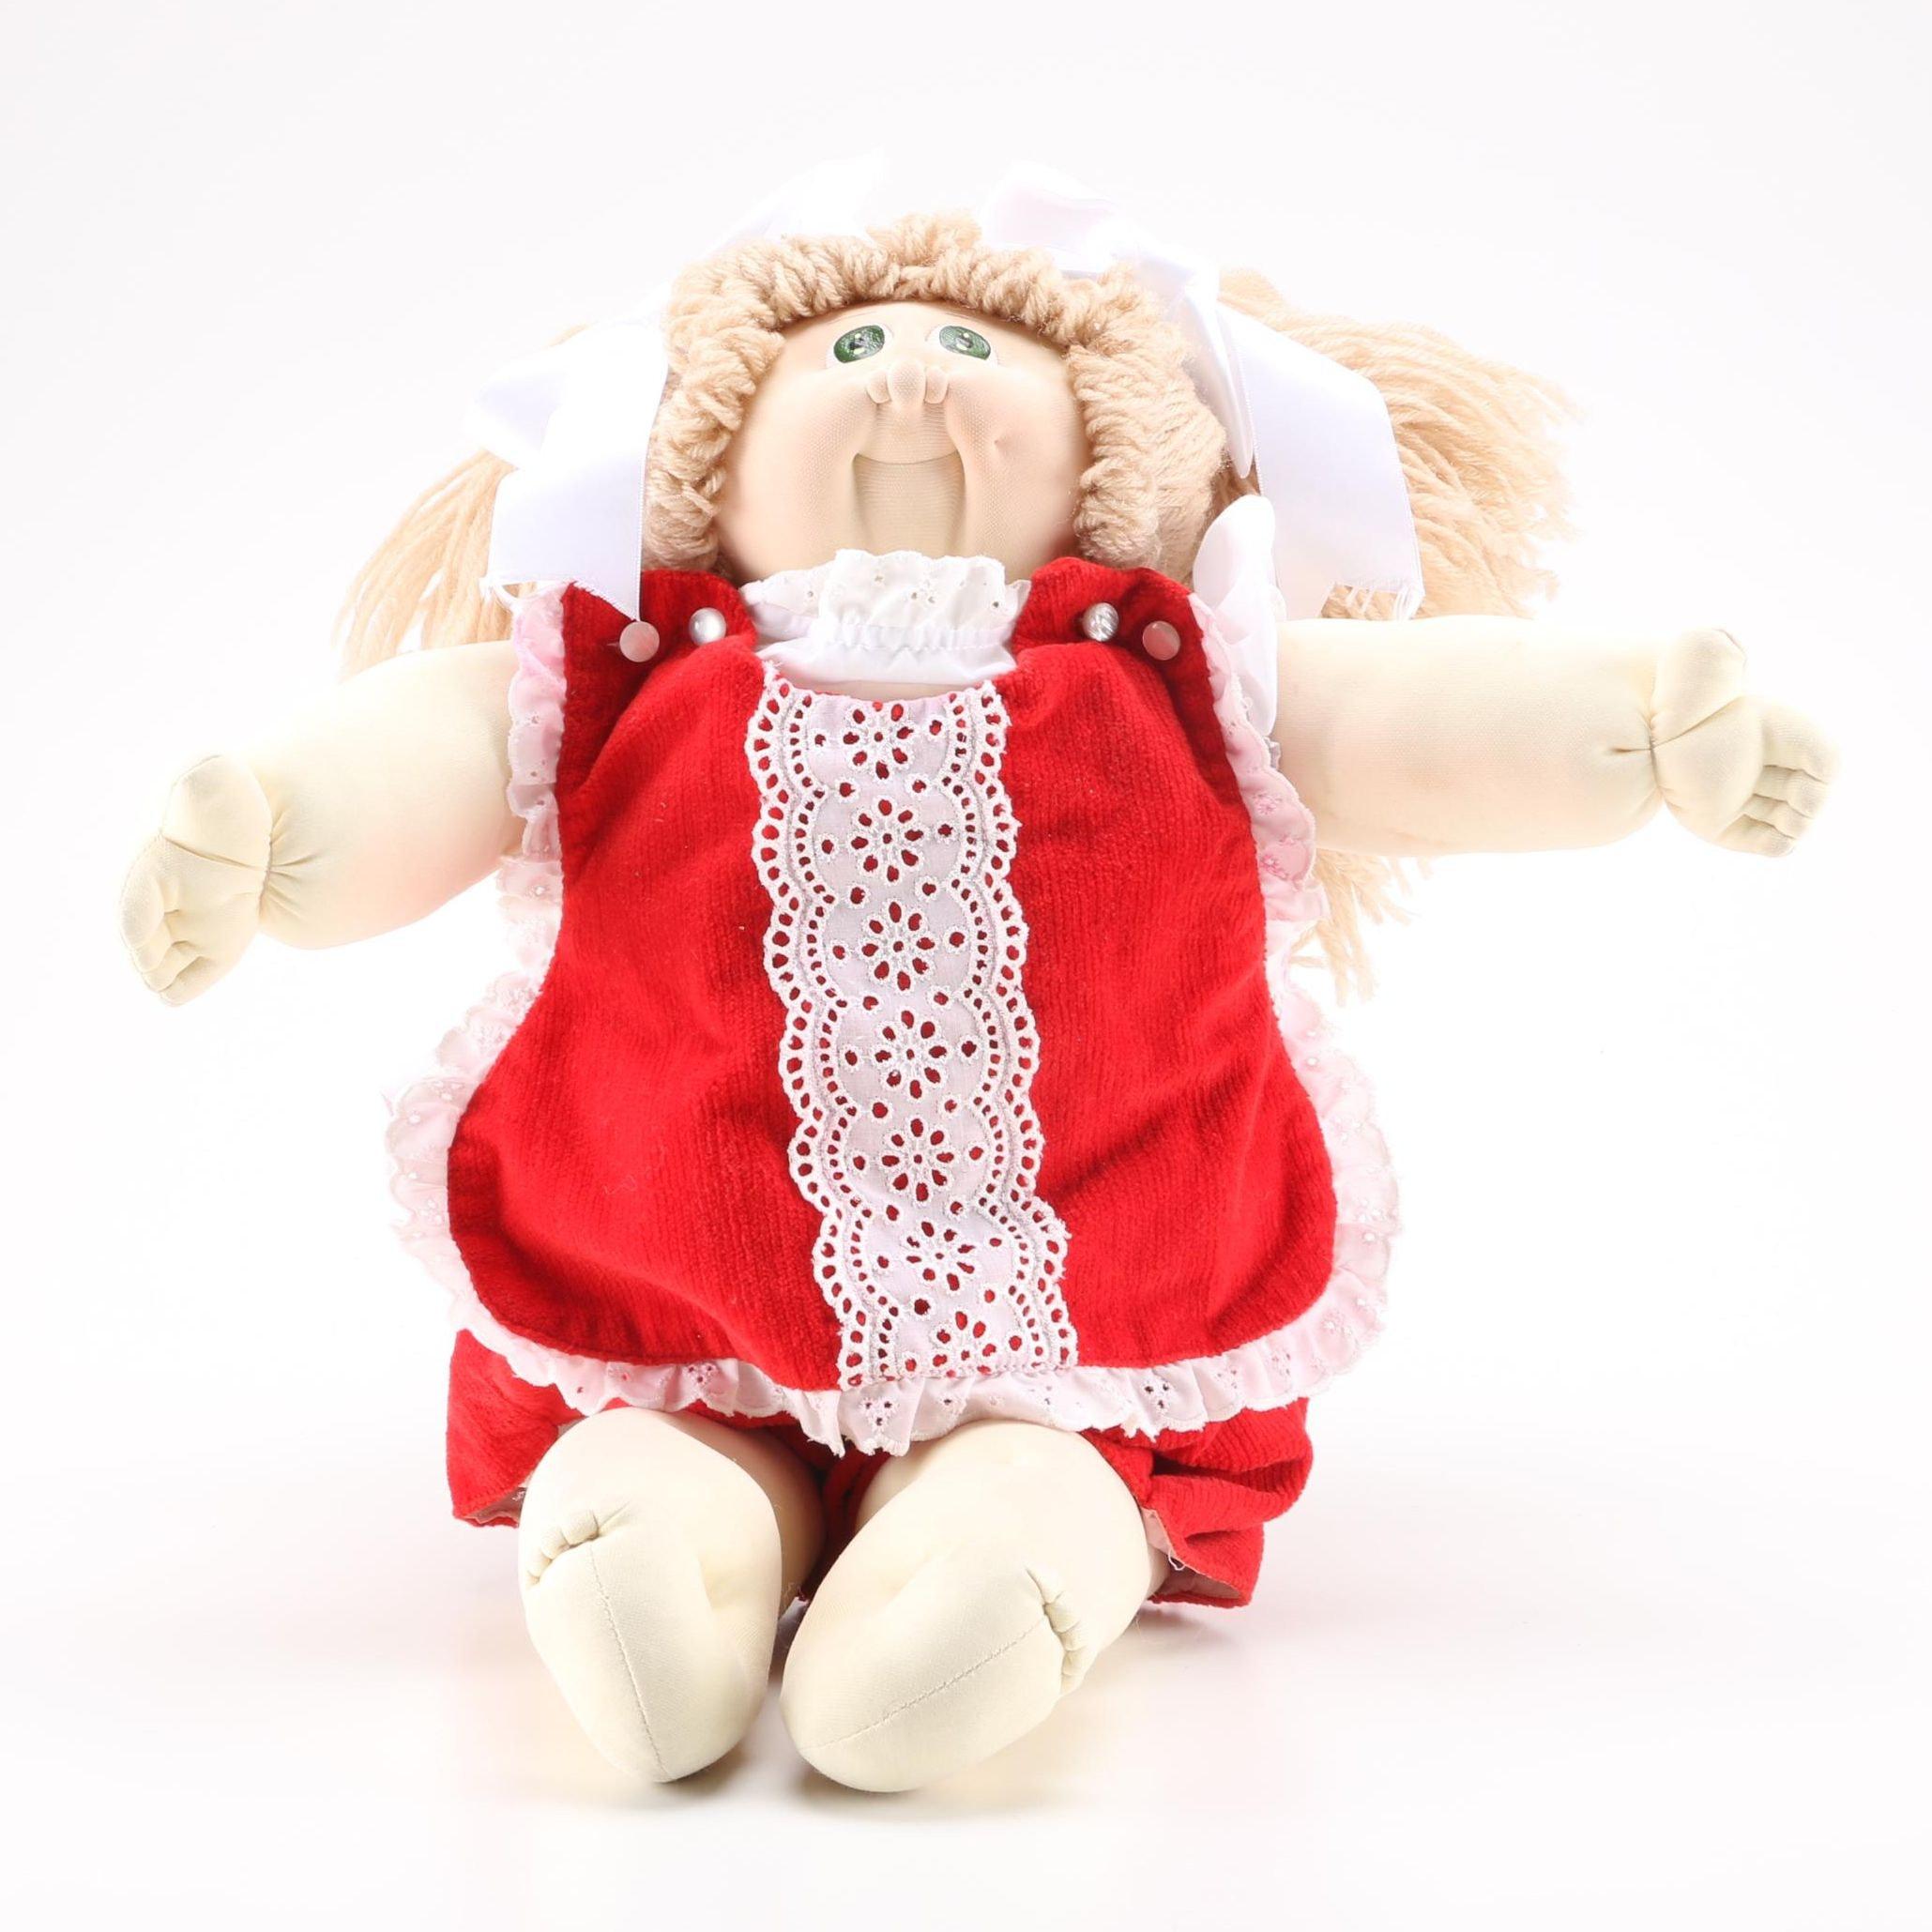 1978 Cabbage Patch 'Mavis Hope' Doll